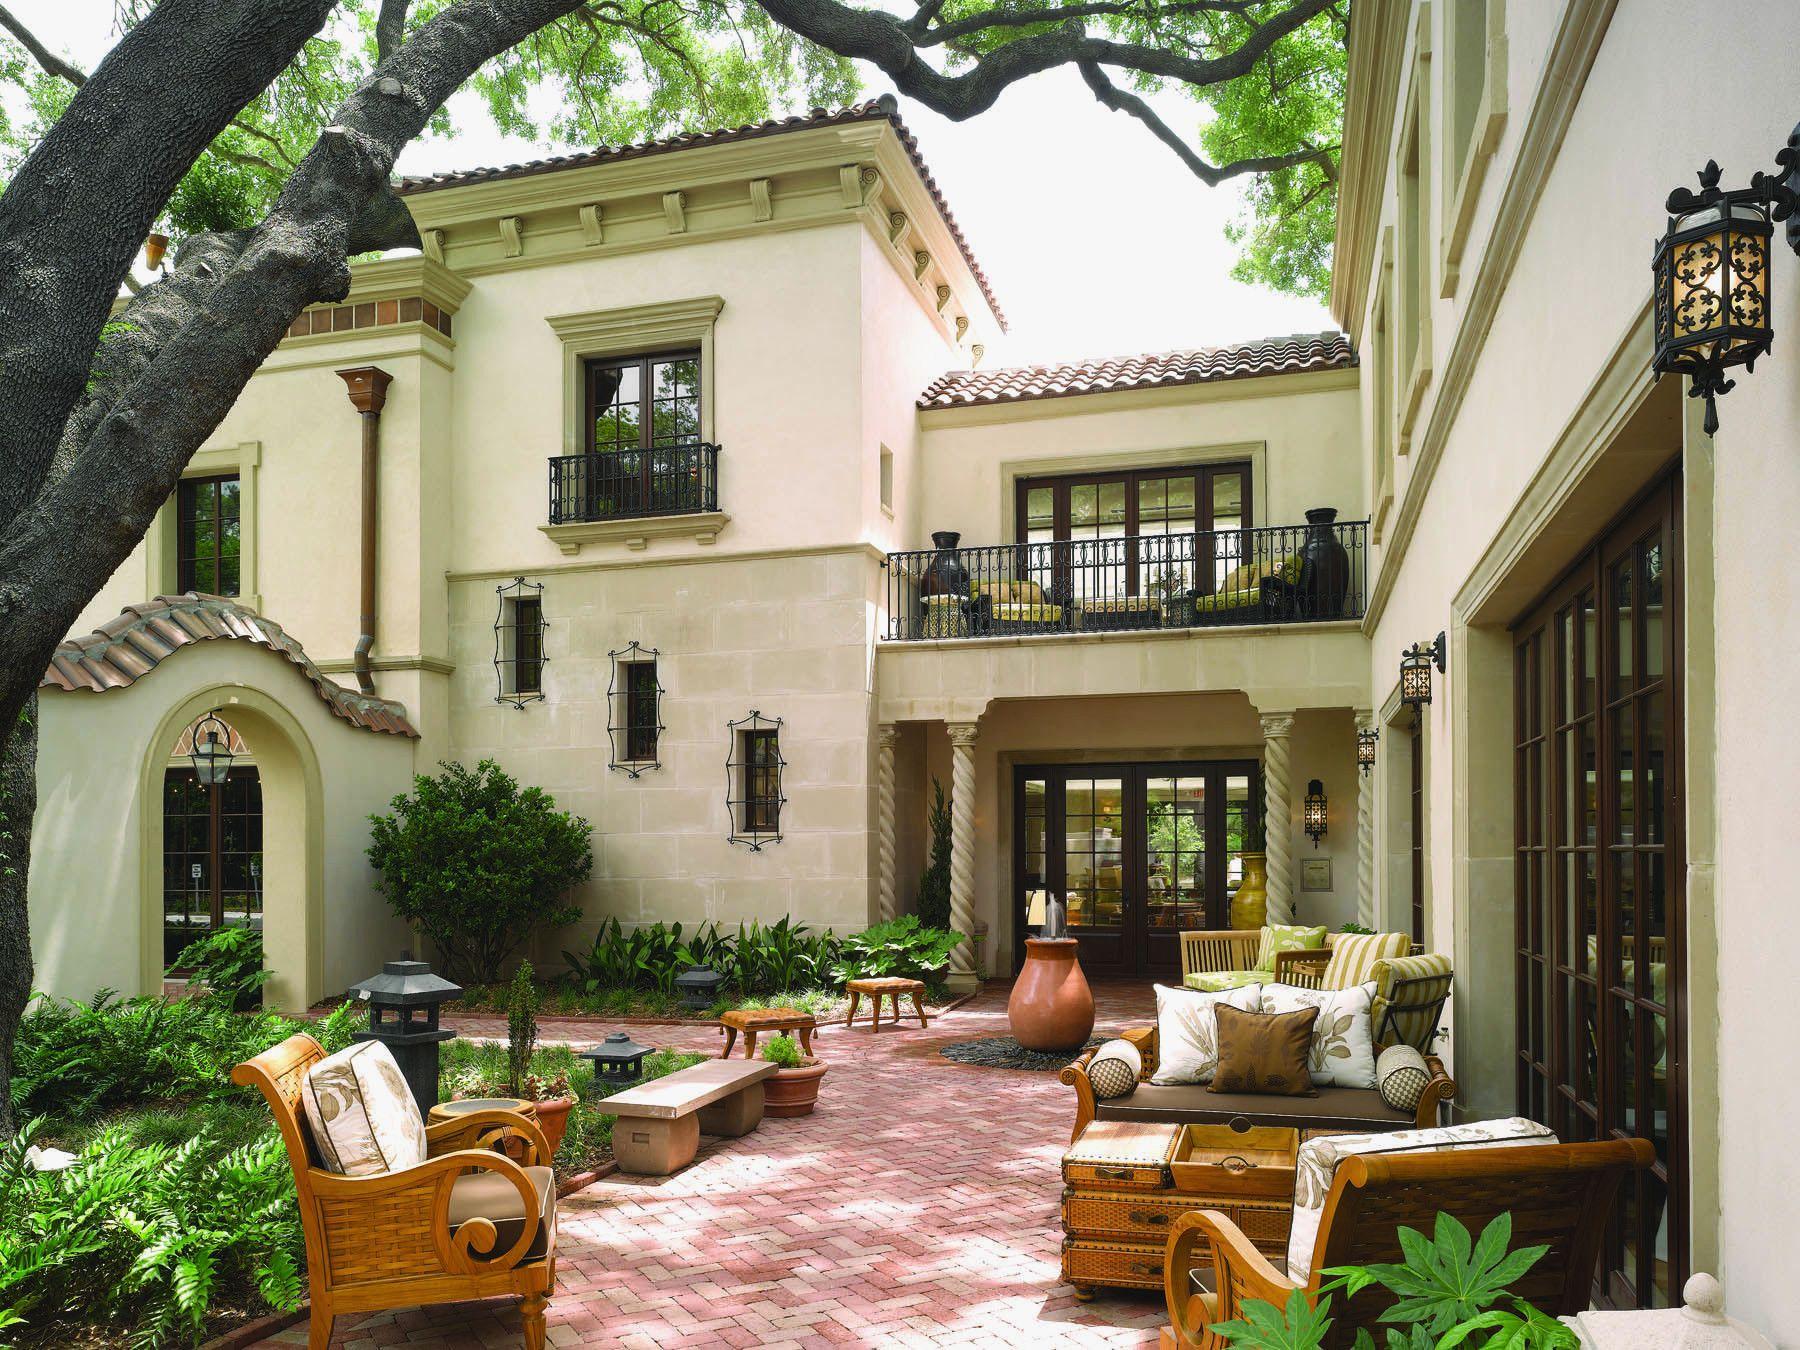 Hacienda House Plans Center Courtyard Inspirational Exterior Joseph Pinterest Www Lib Spanish Style Homes Courtyard House Plans Colonial Revival Architecture